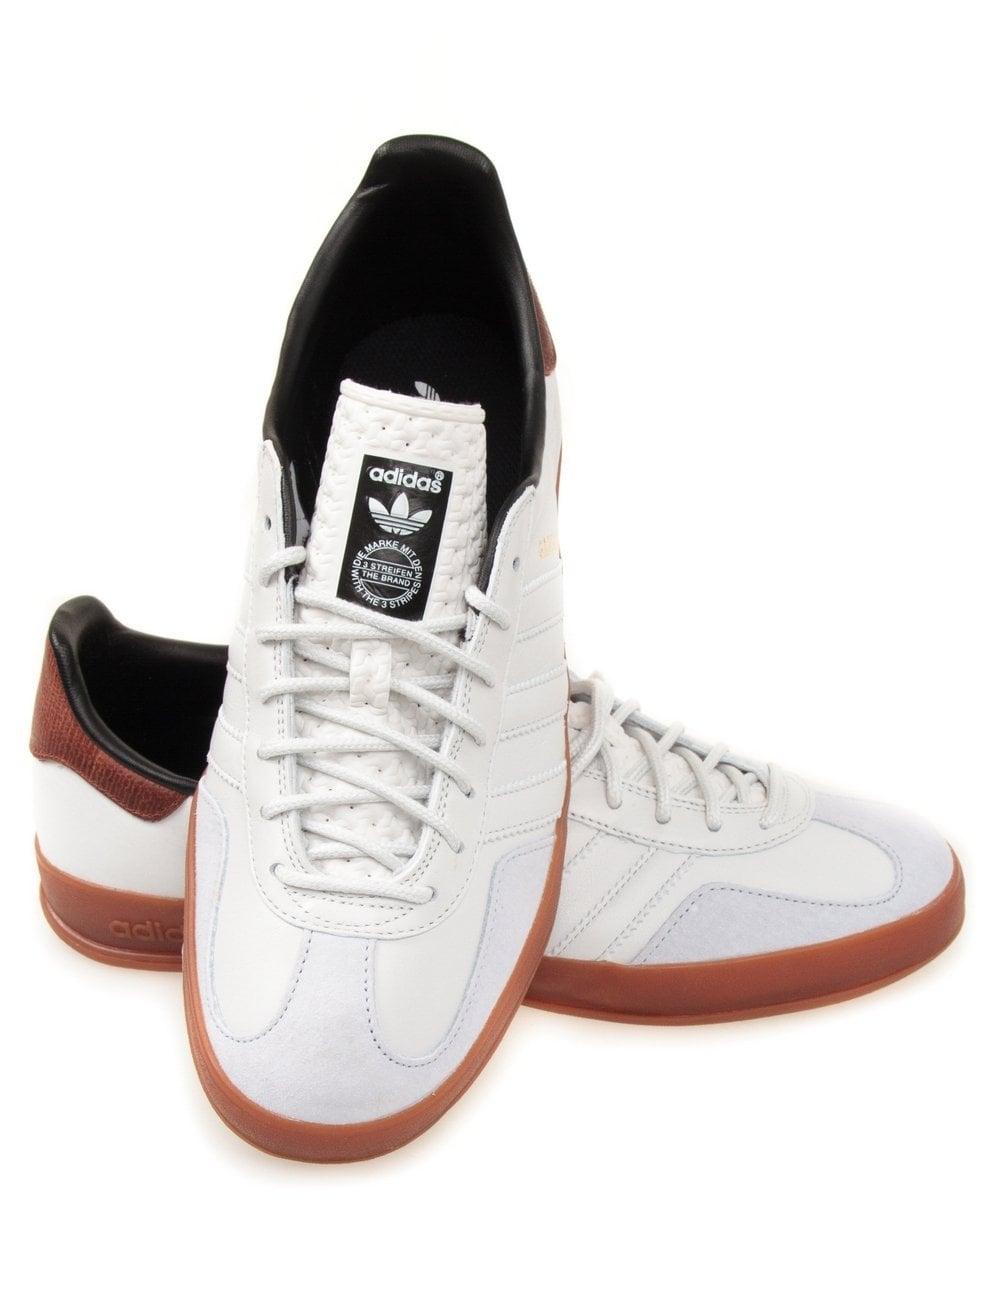 Adidas Originals Gazelle Indoor Trainers - Neo White